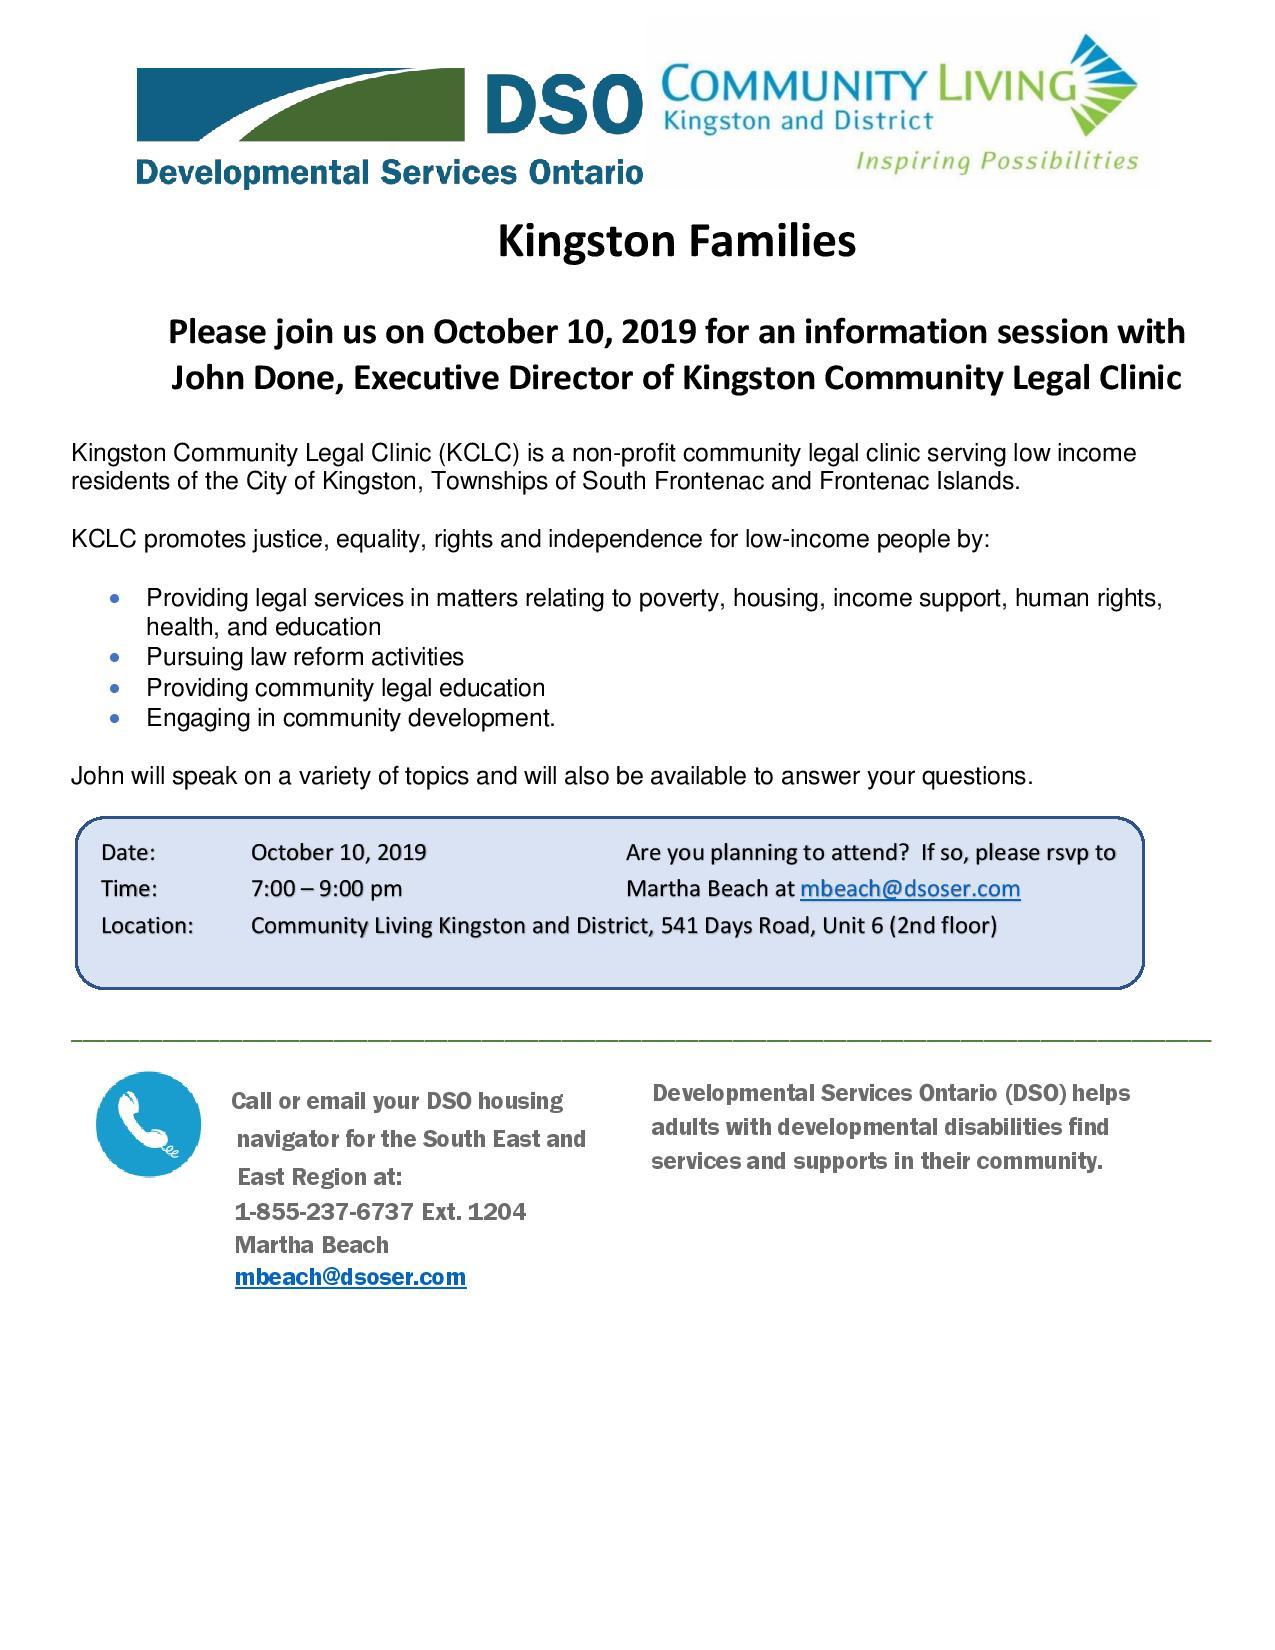 Housing Coordinator Flyer - Kingston - October 10 2019-page-001 (1).jpg